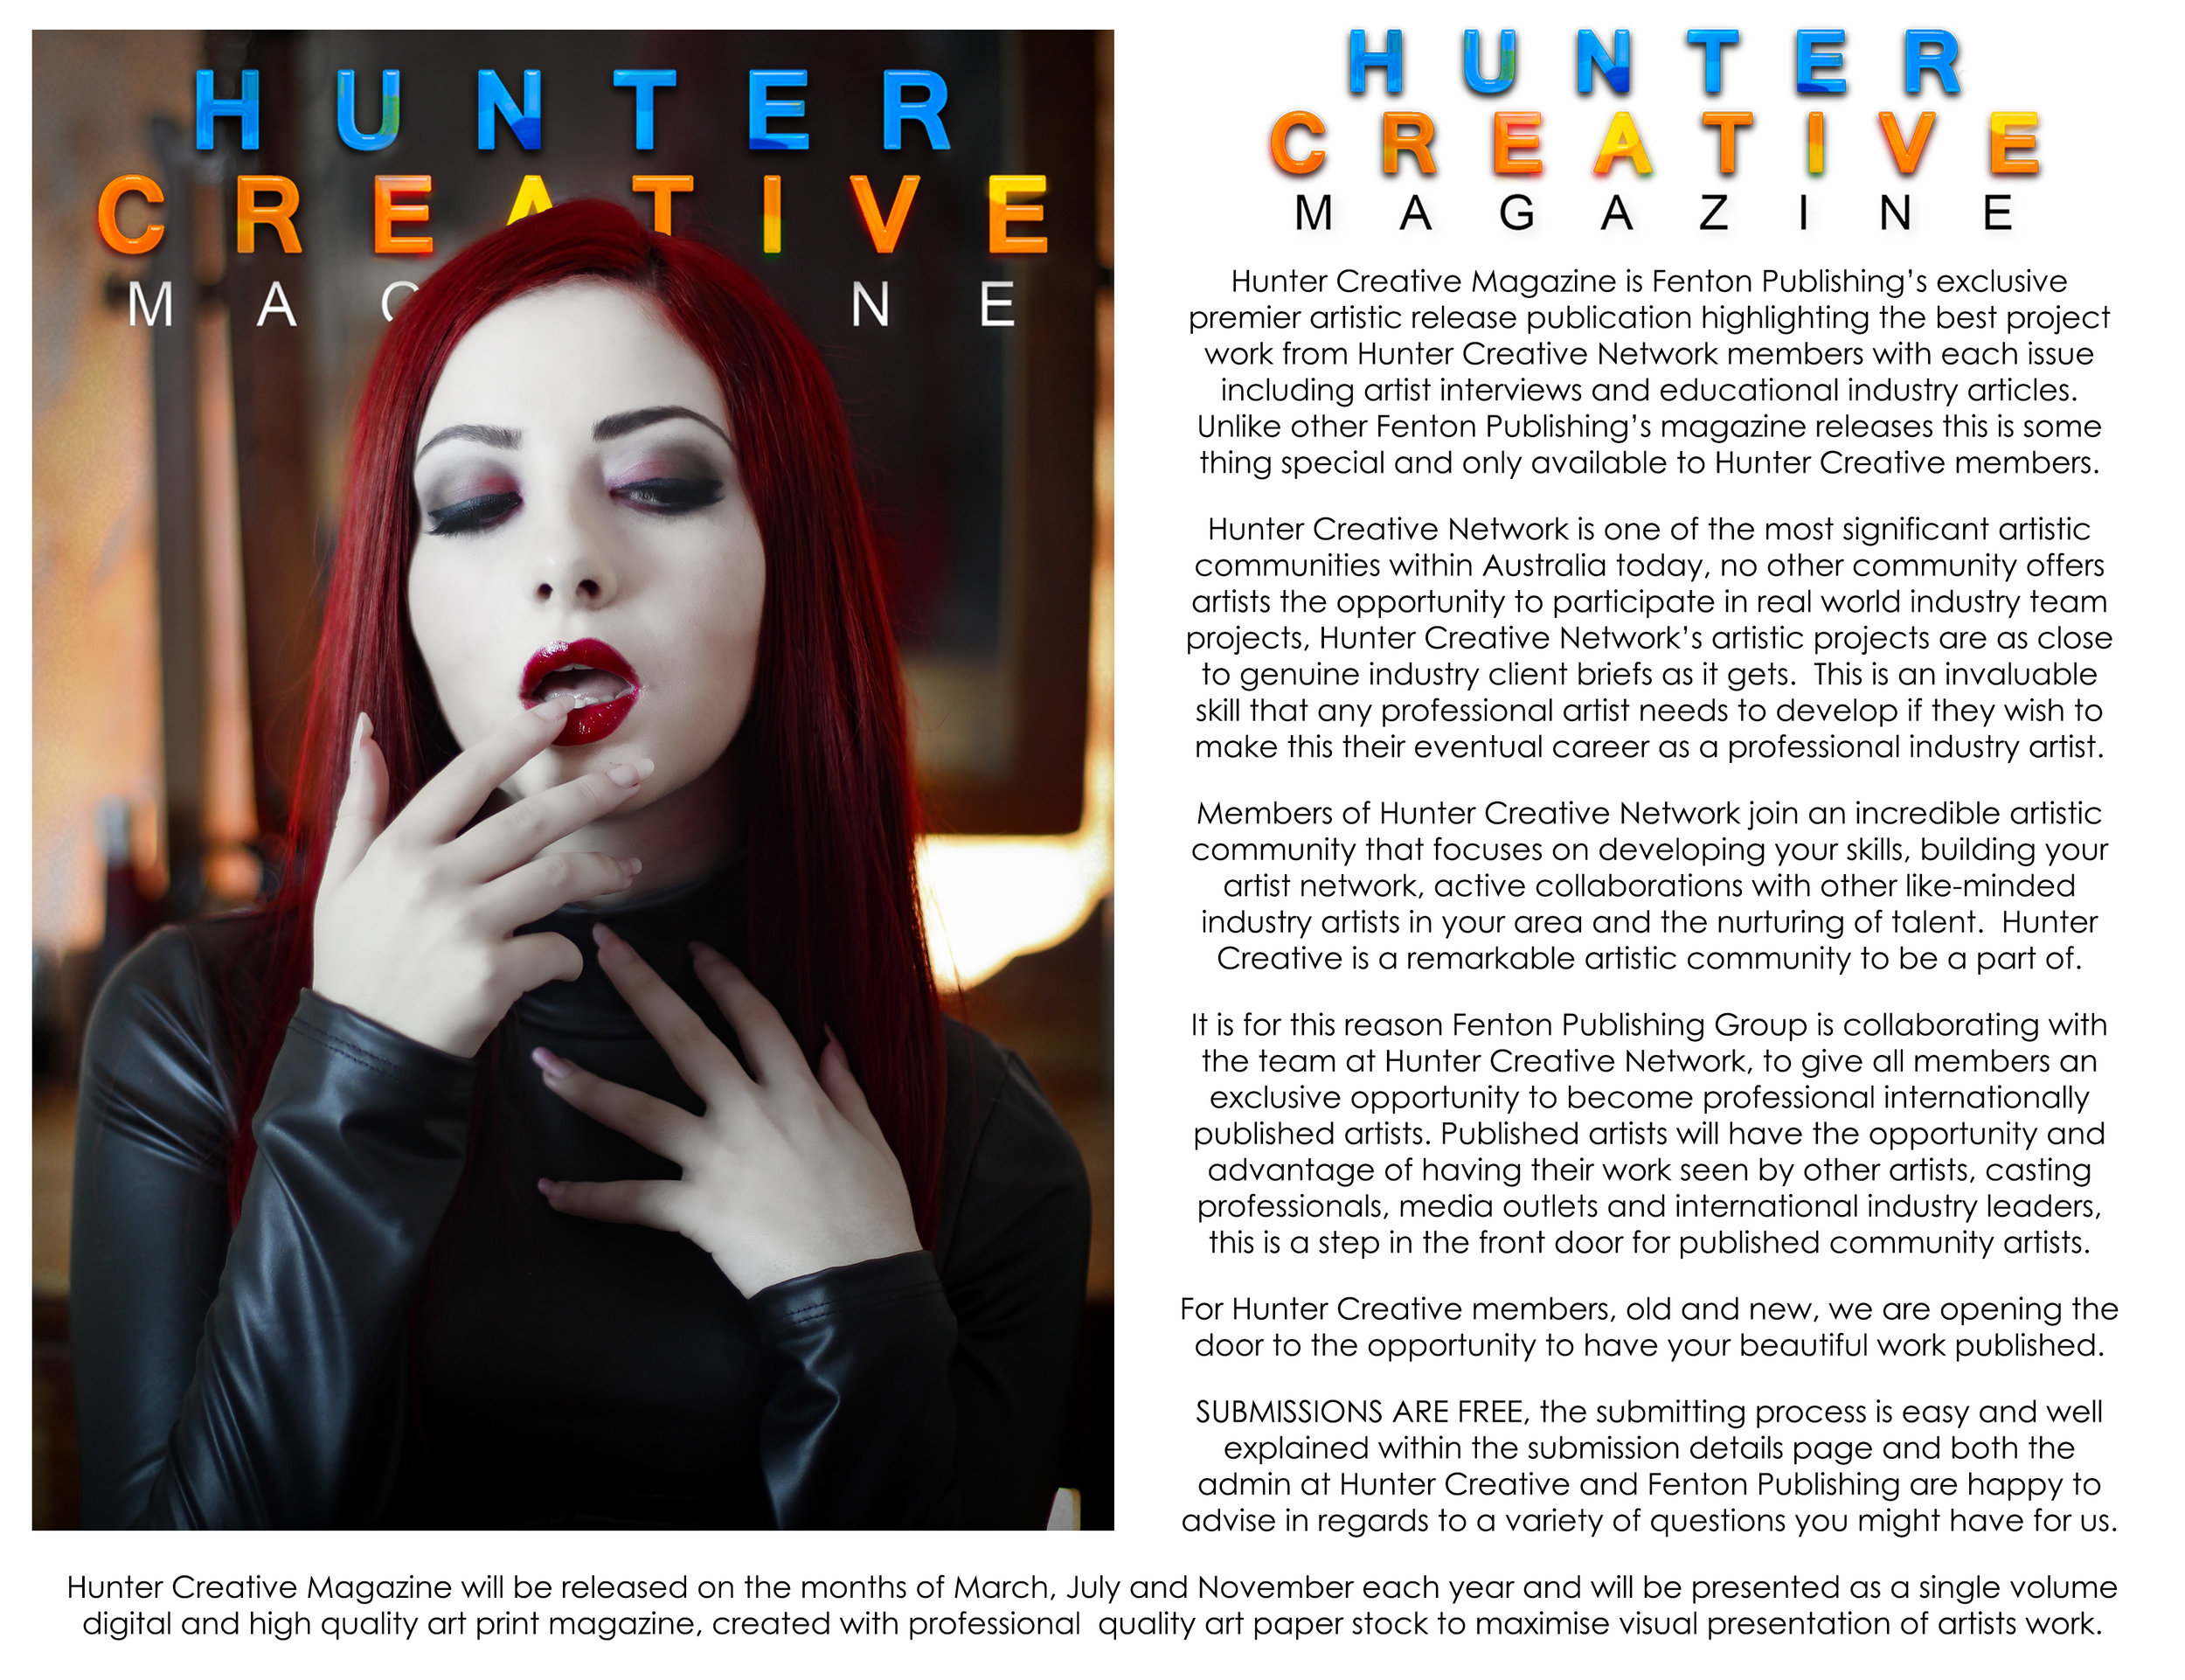 Hunter Creative Mag Info.jpg